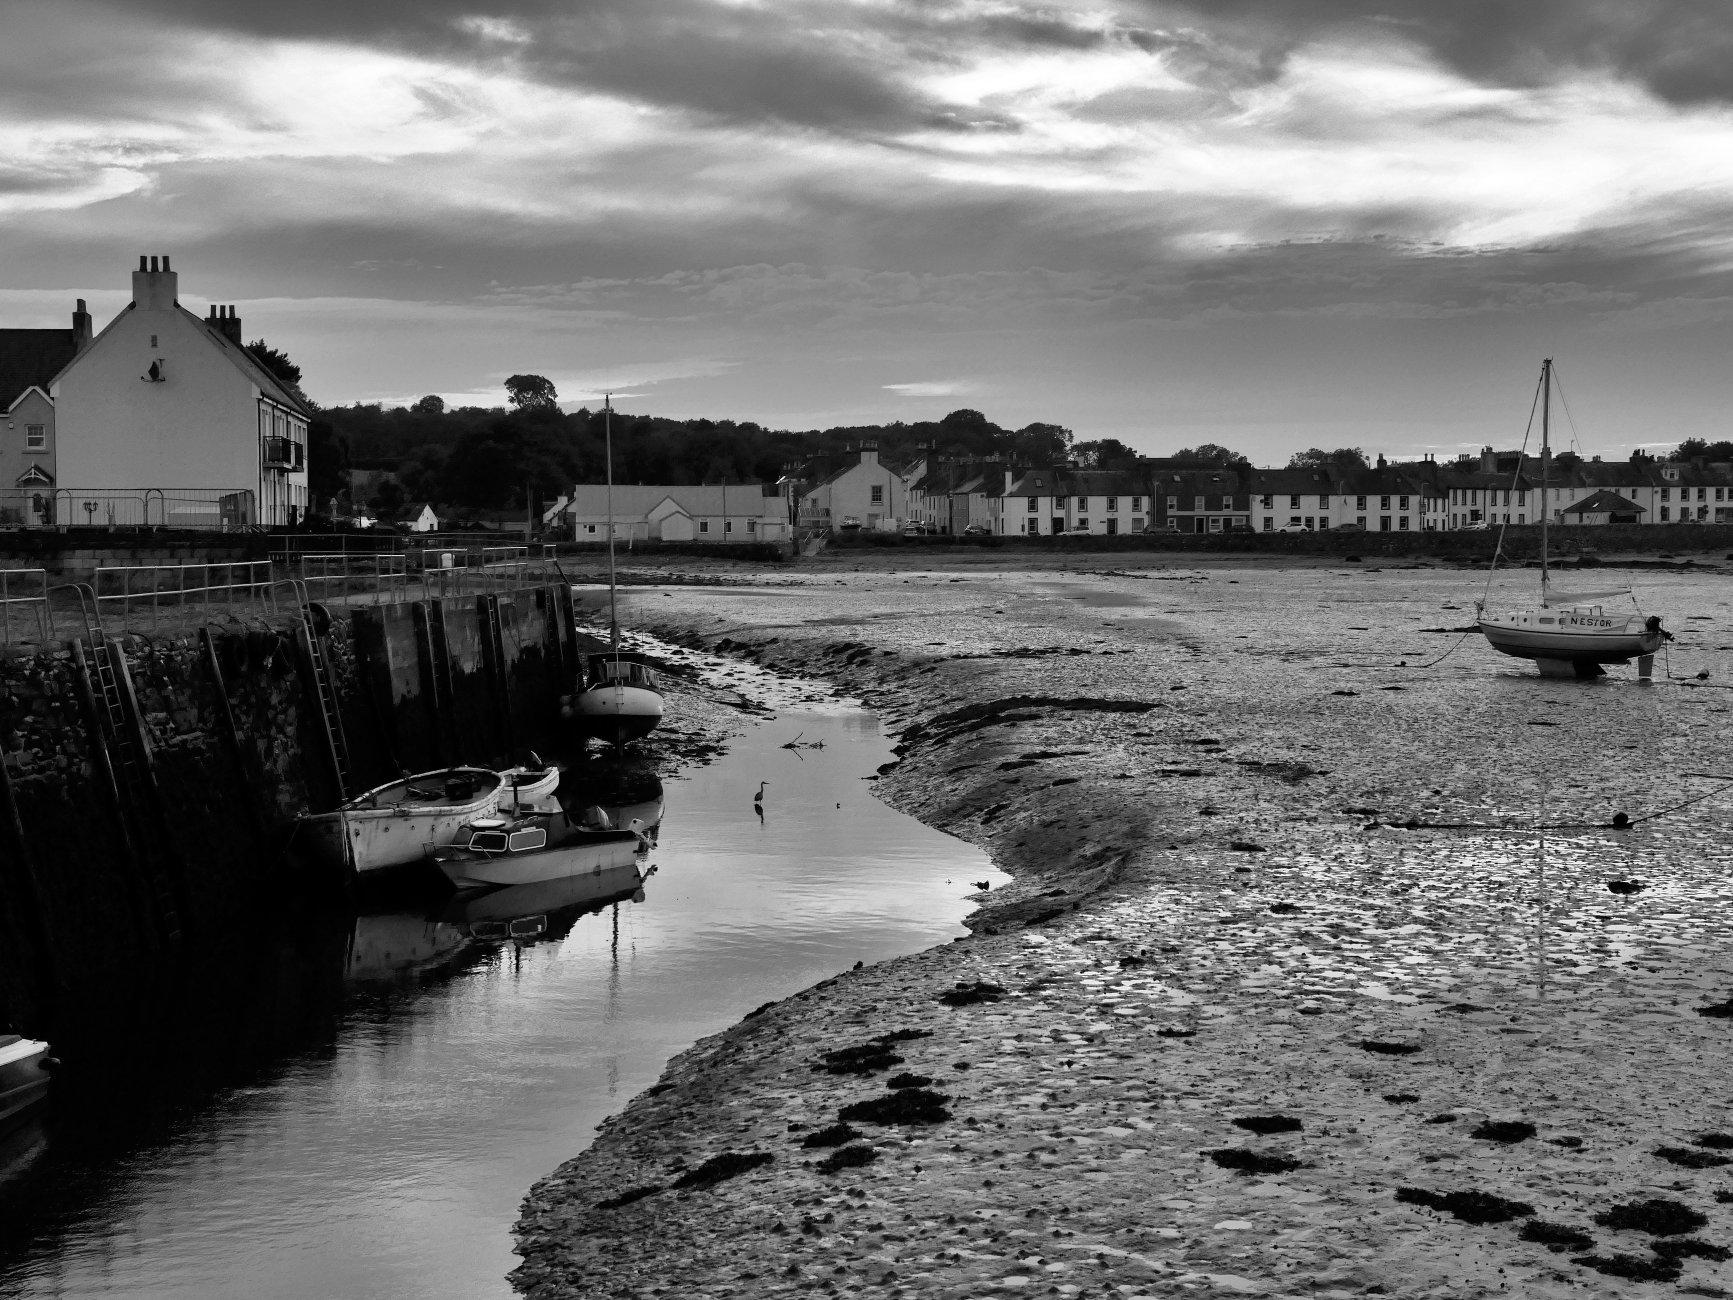 The Harbour Garlieston at low tide